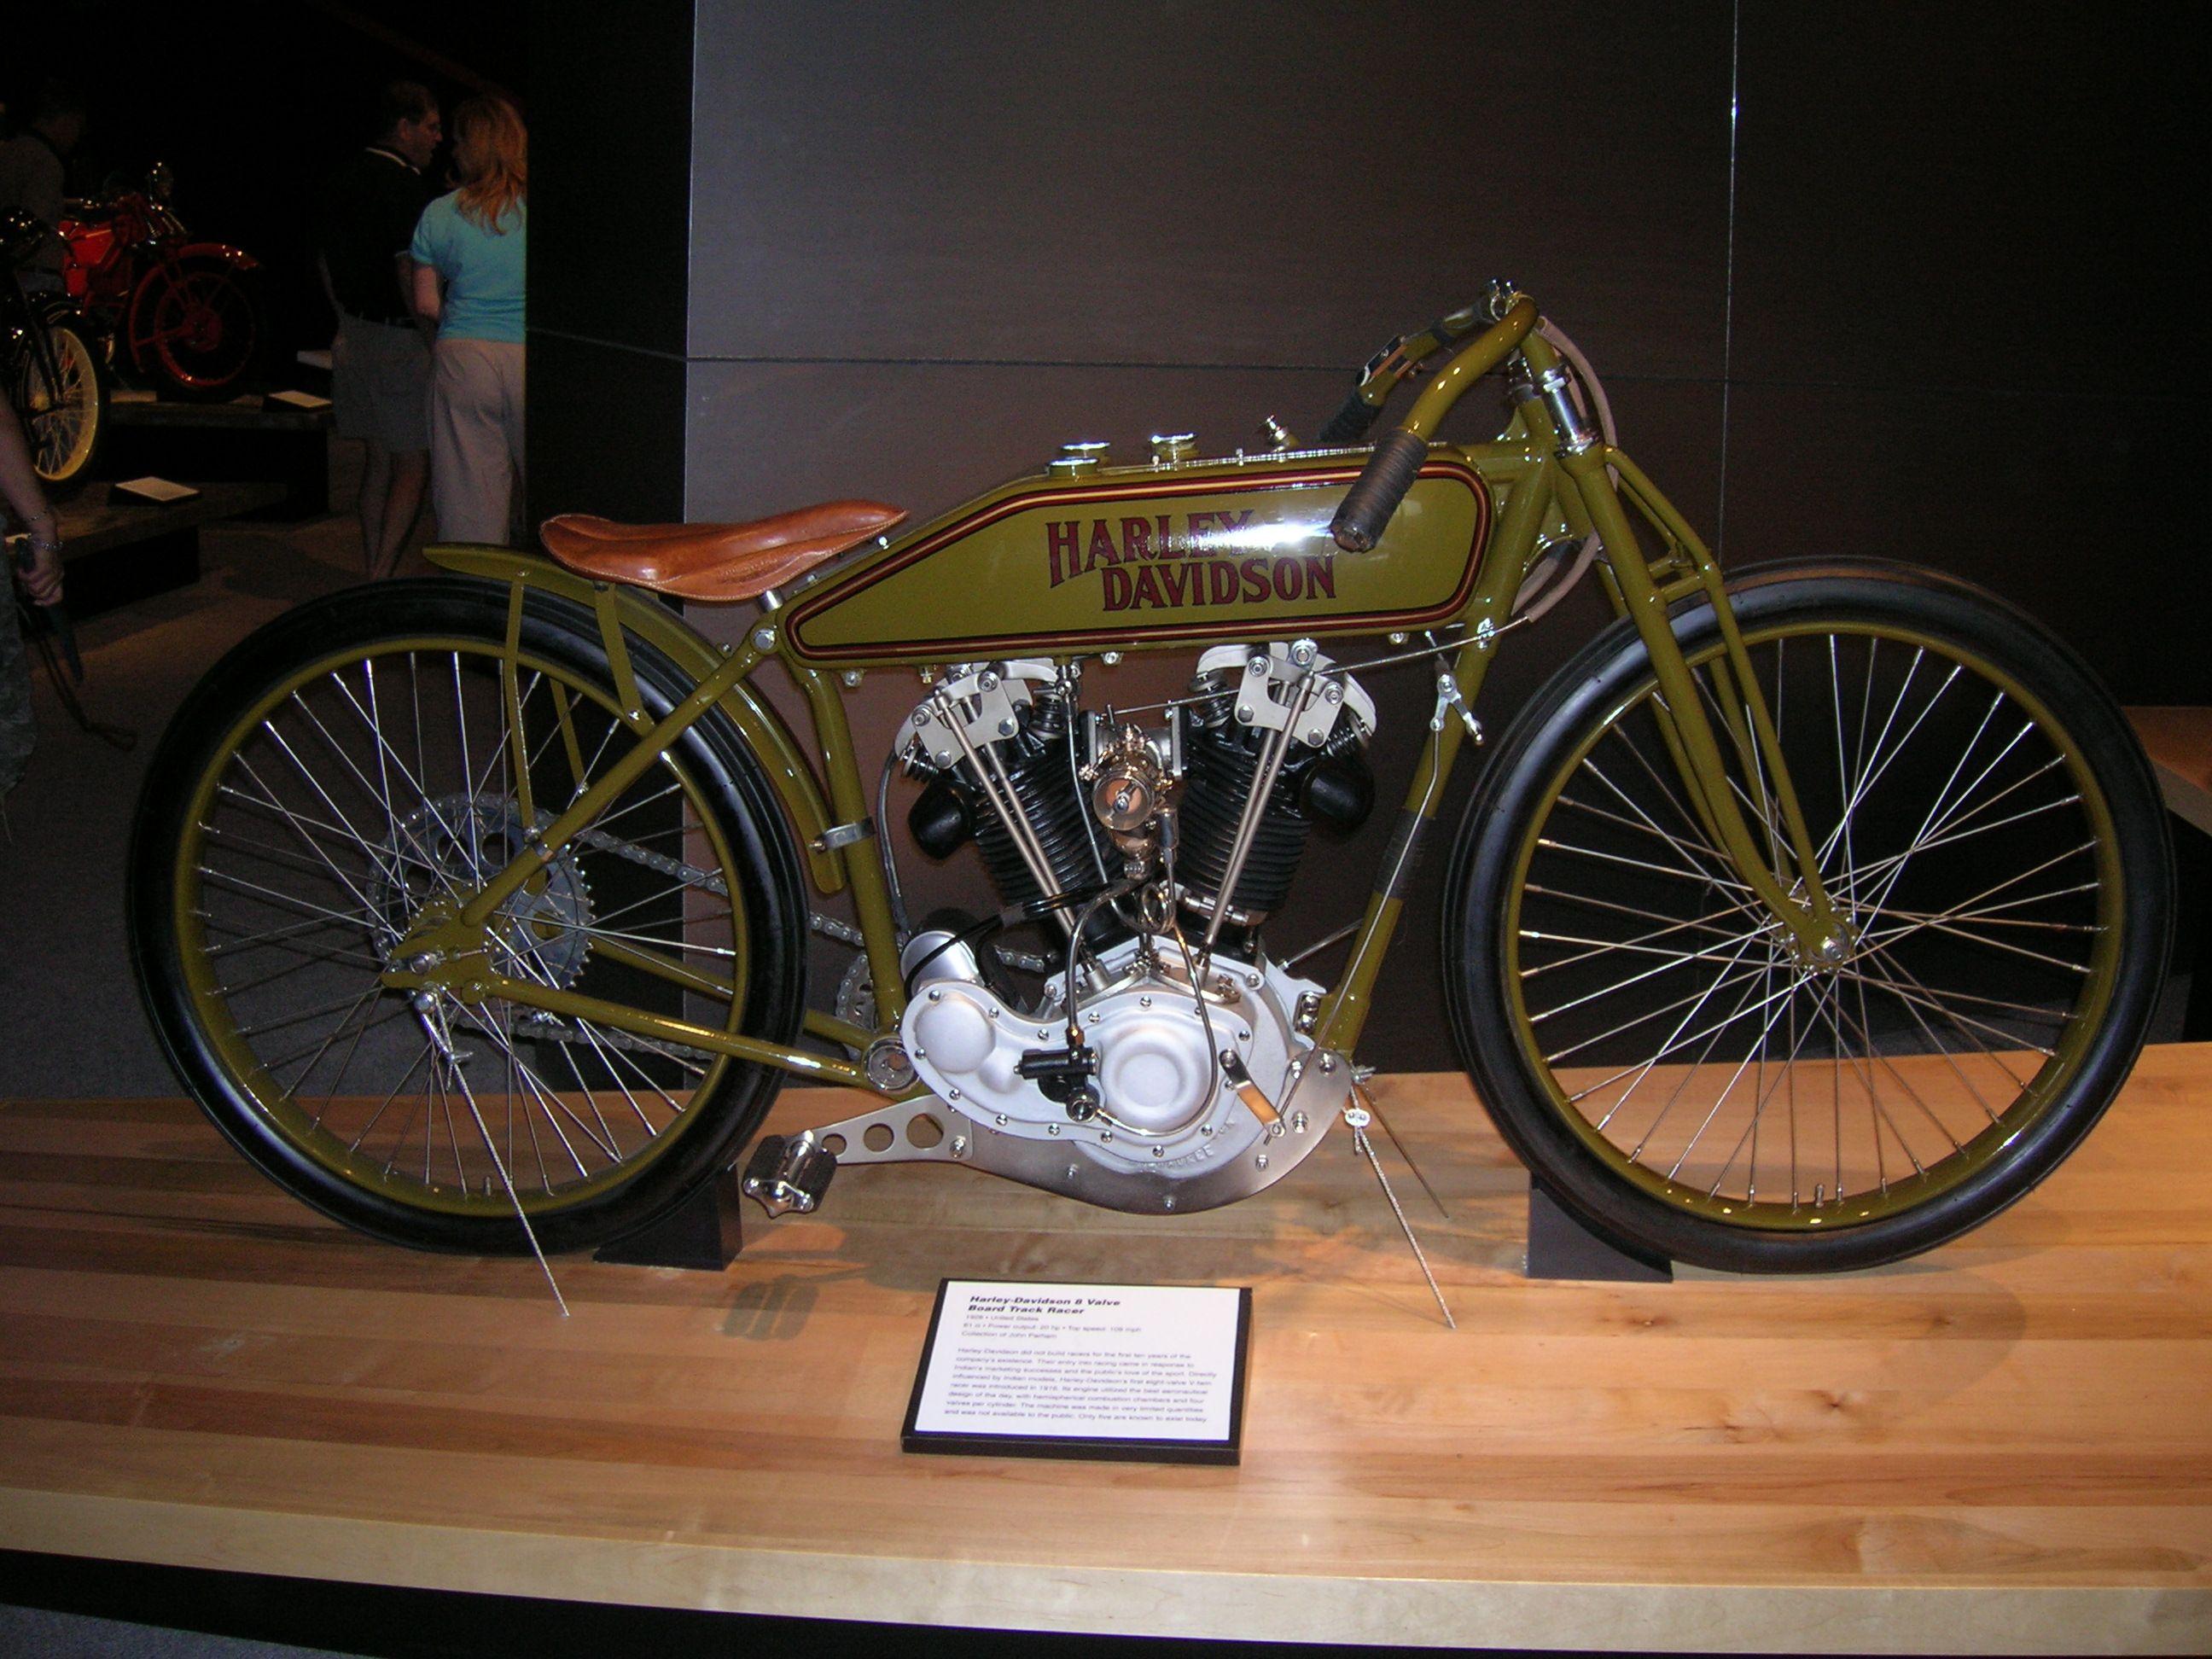 1928 Harley-Davidson 8 Valve Board Track Racer